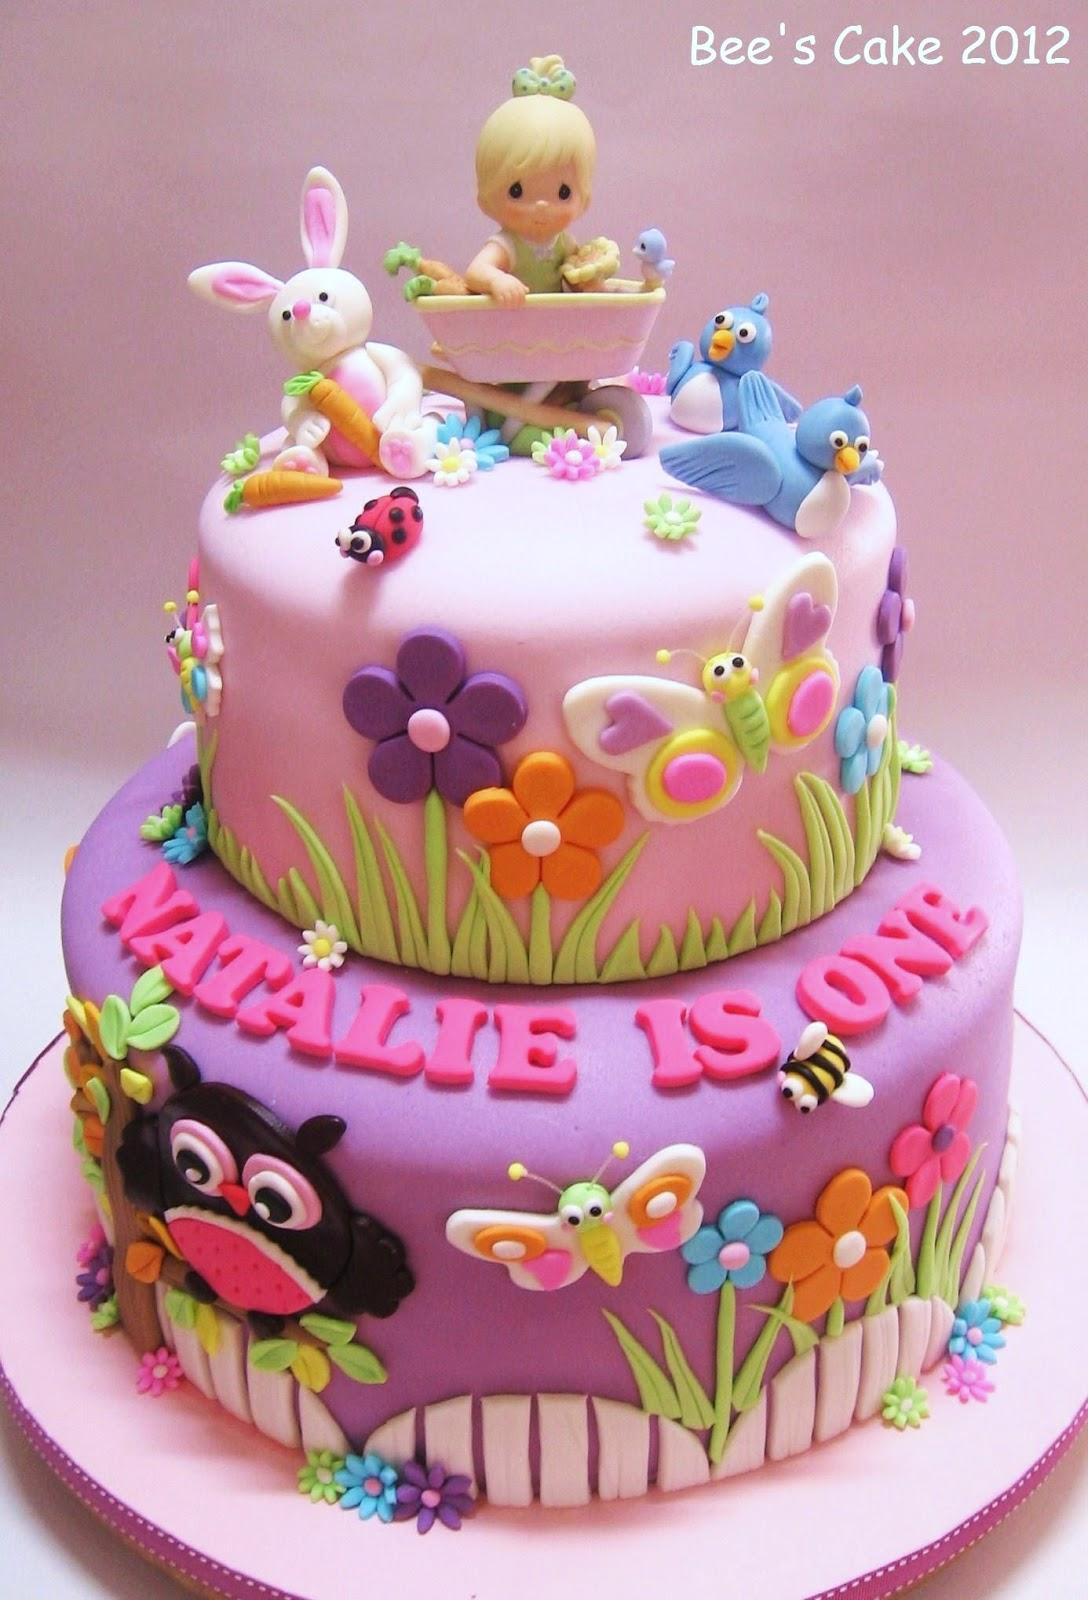 Toddler Birthday Cake Pictures : Bee s Cake: Natalie s Garden